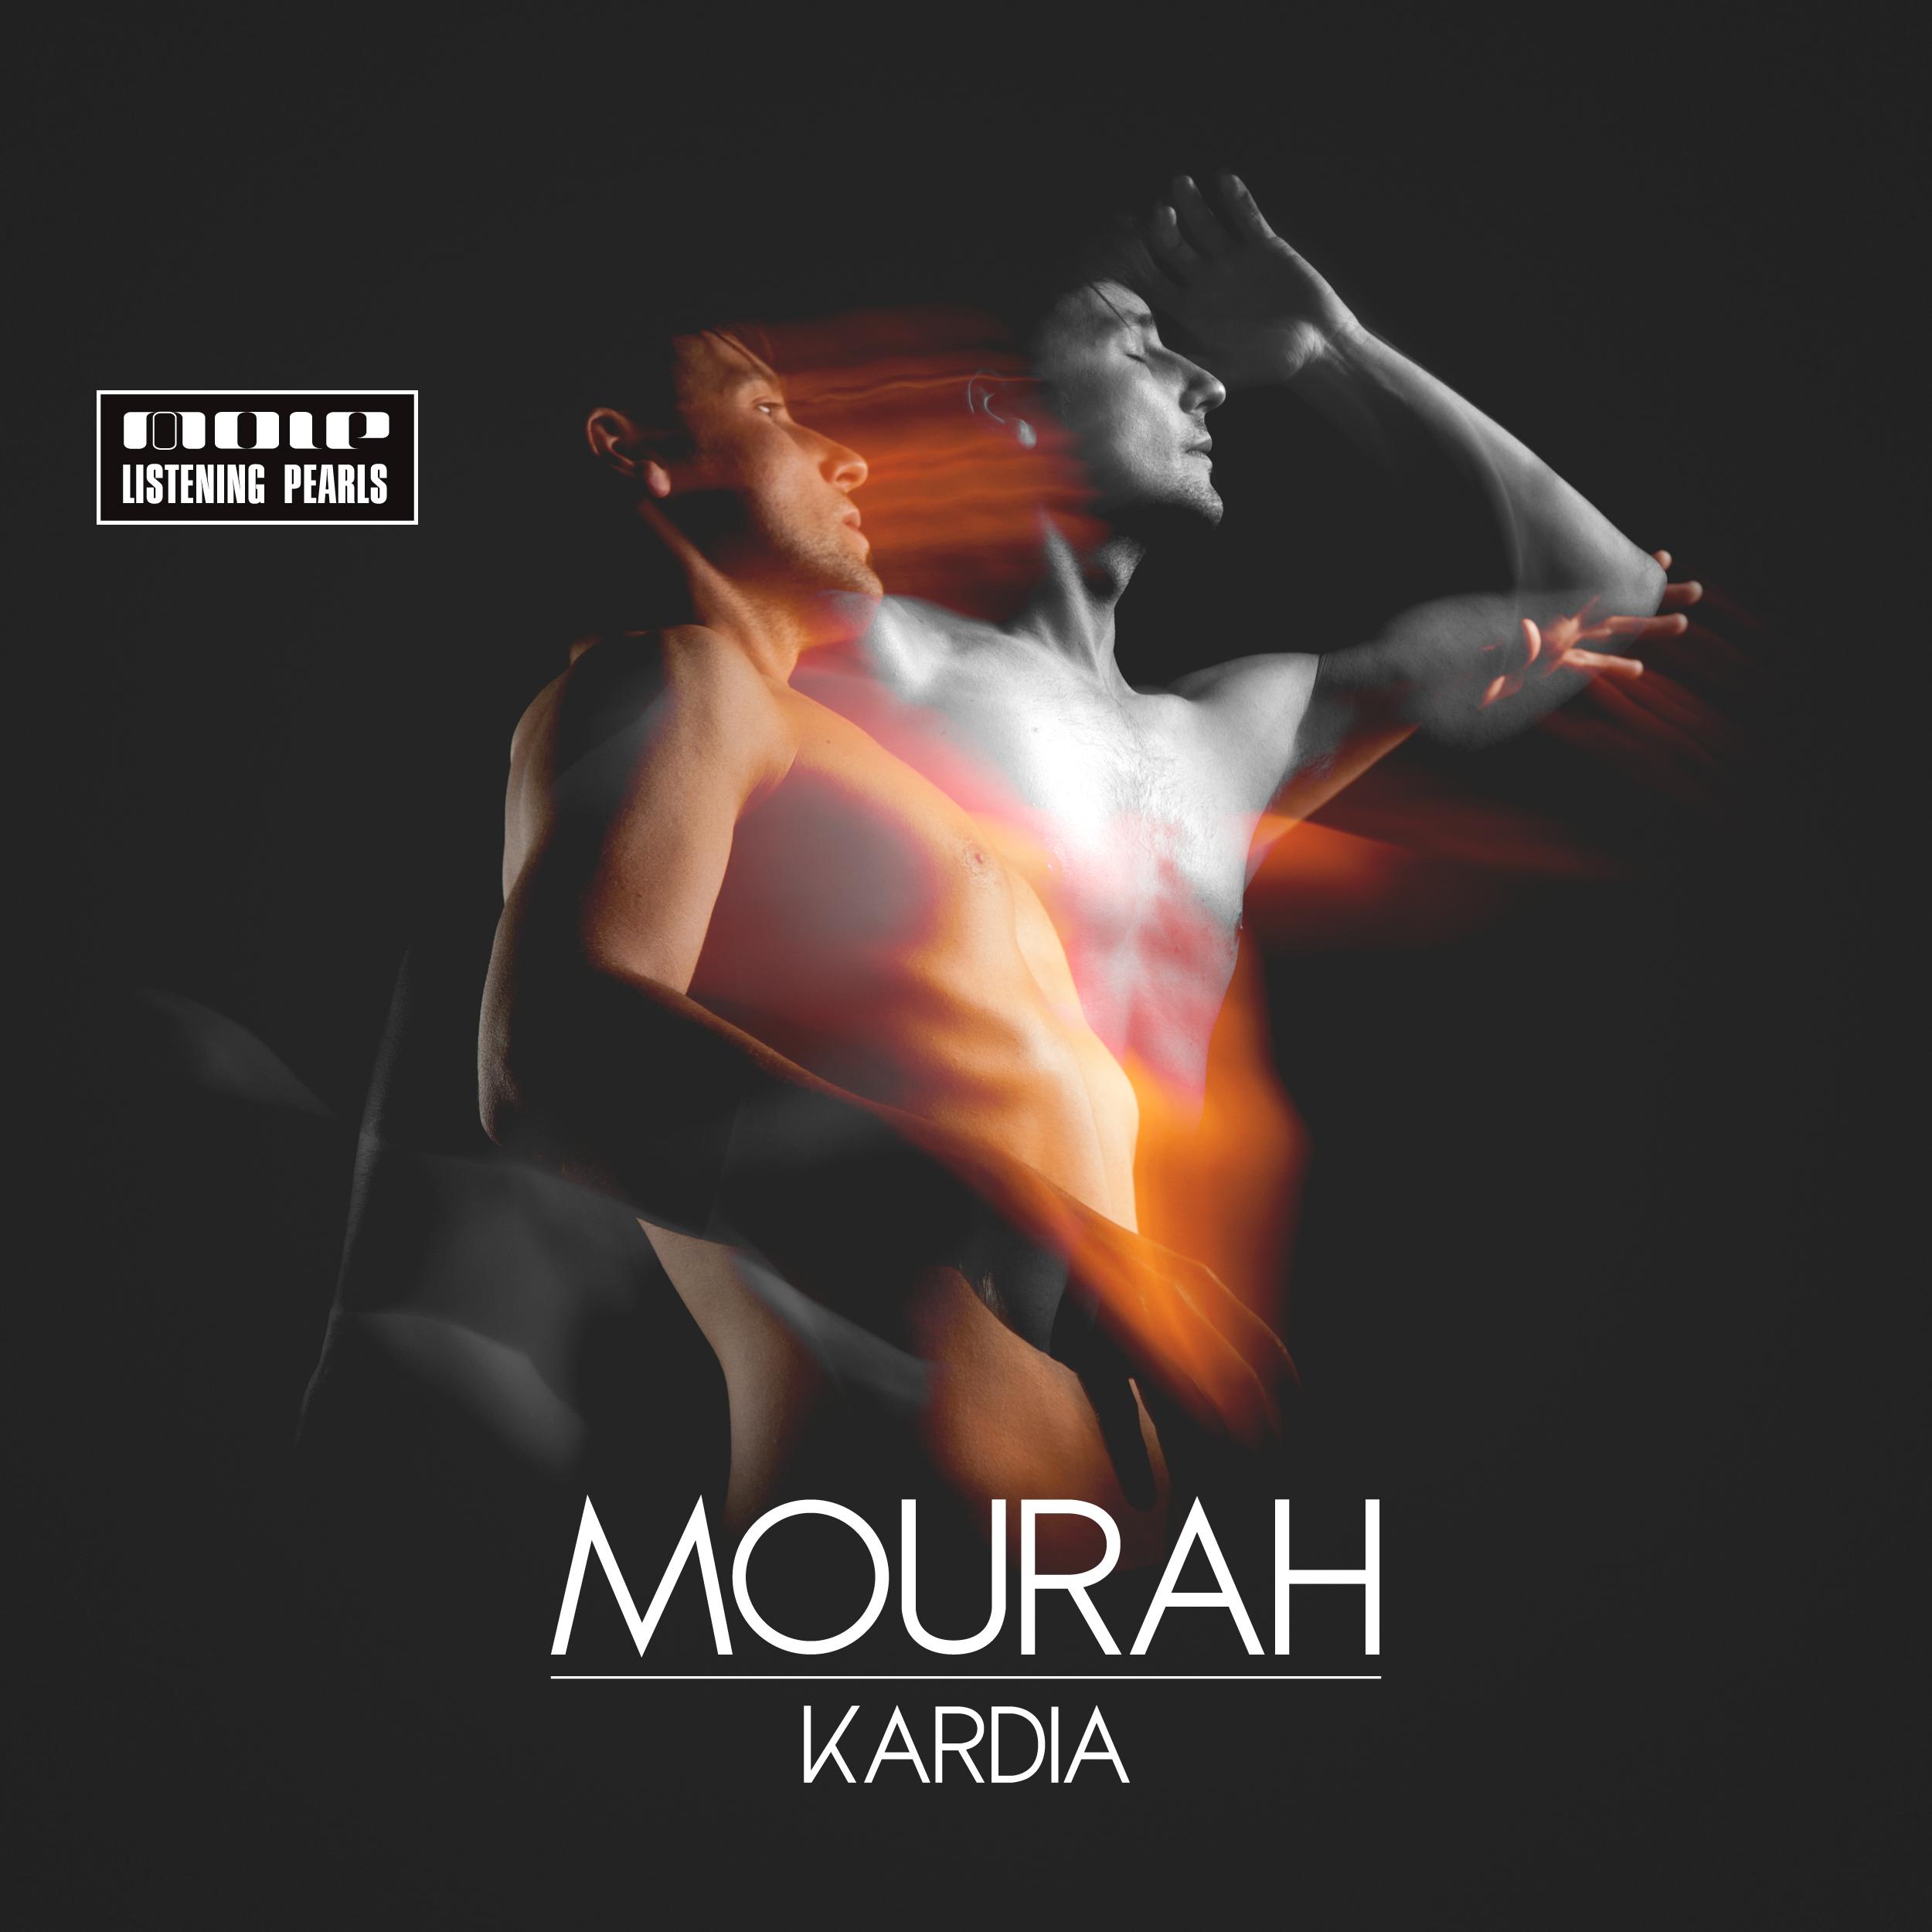 Mourah - Kardia